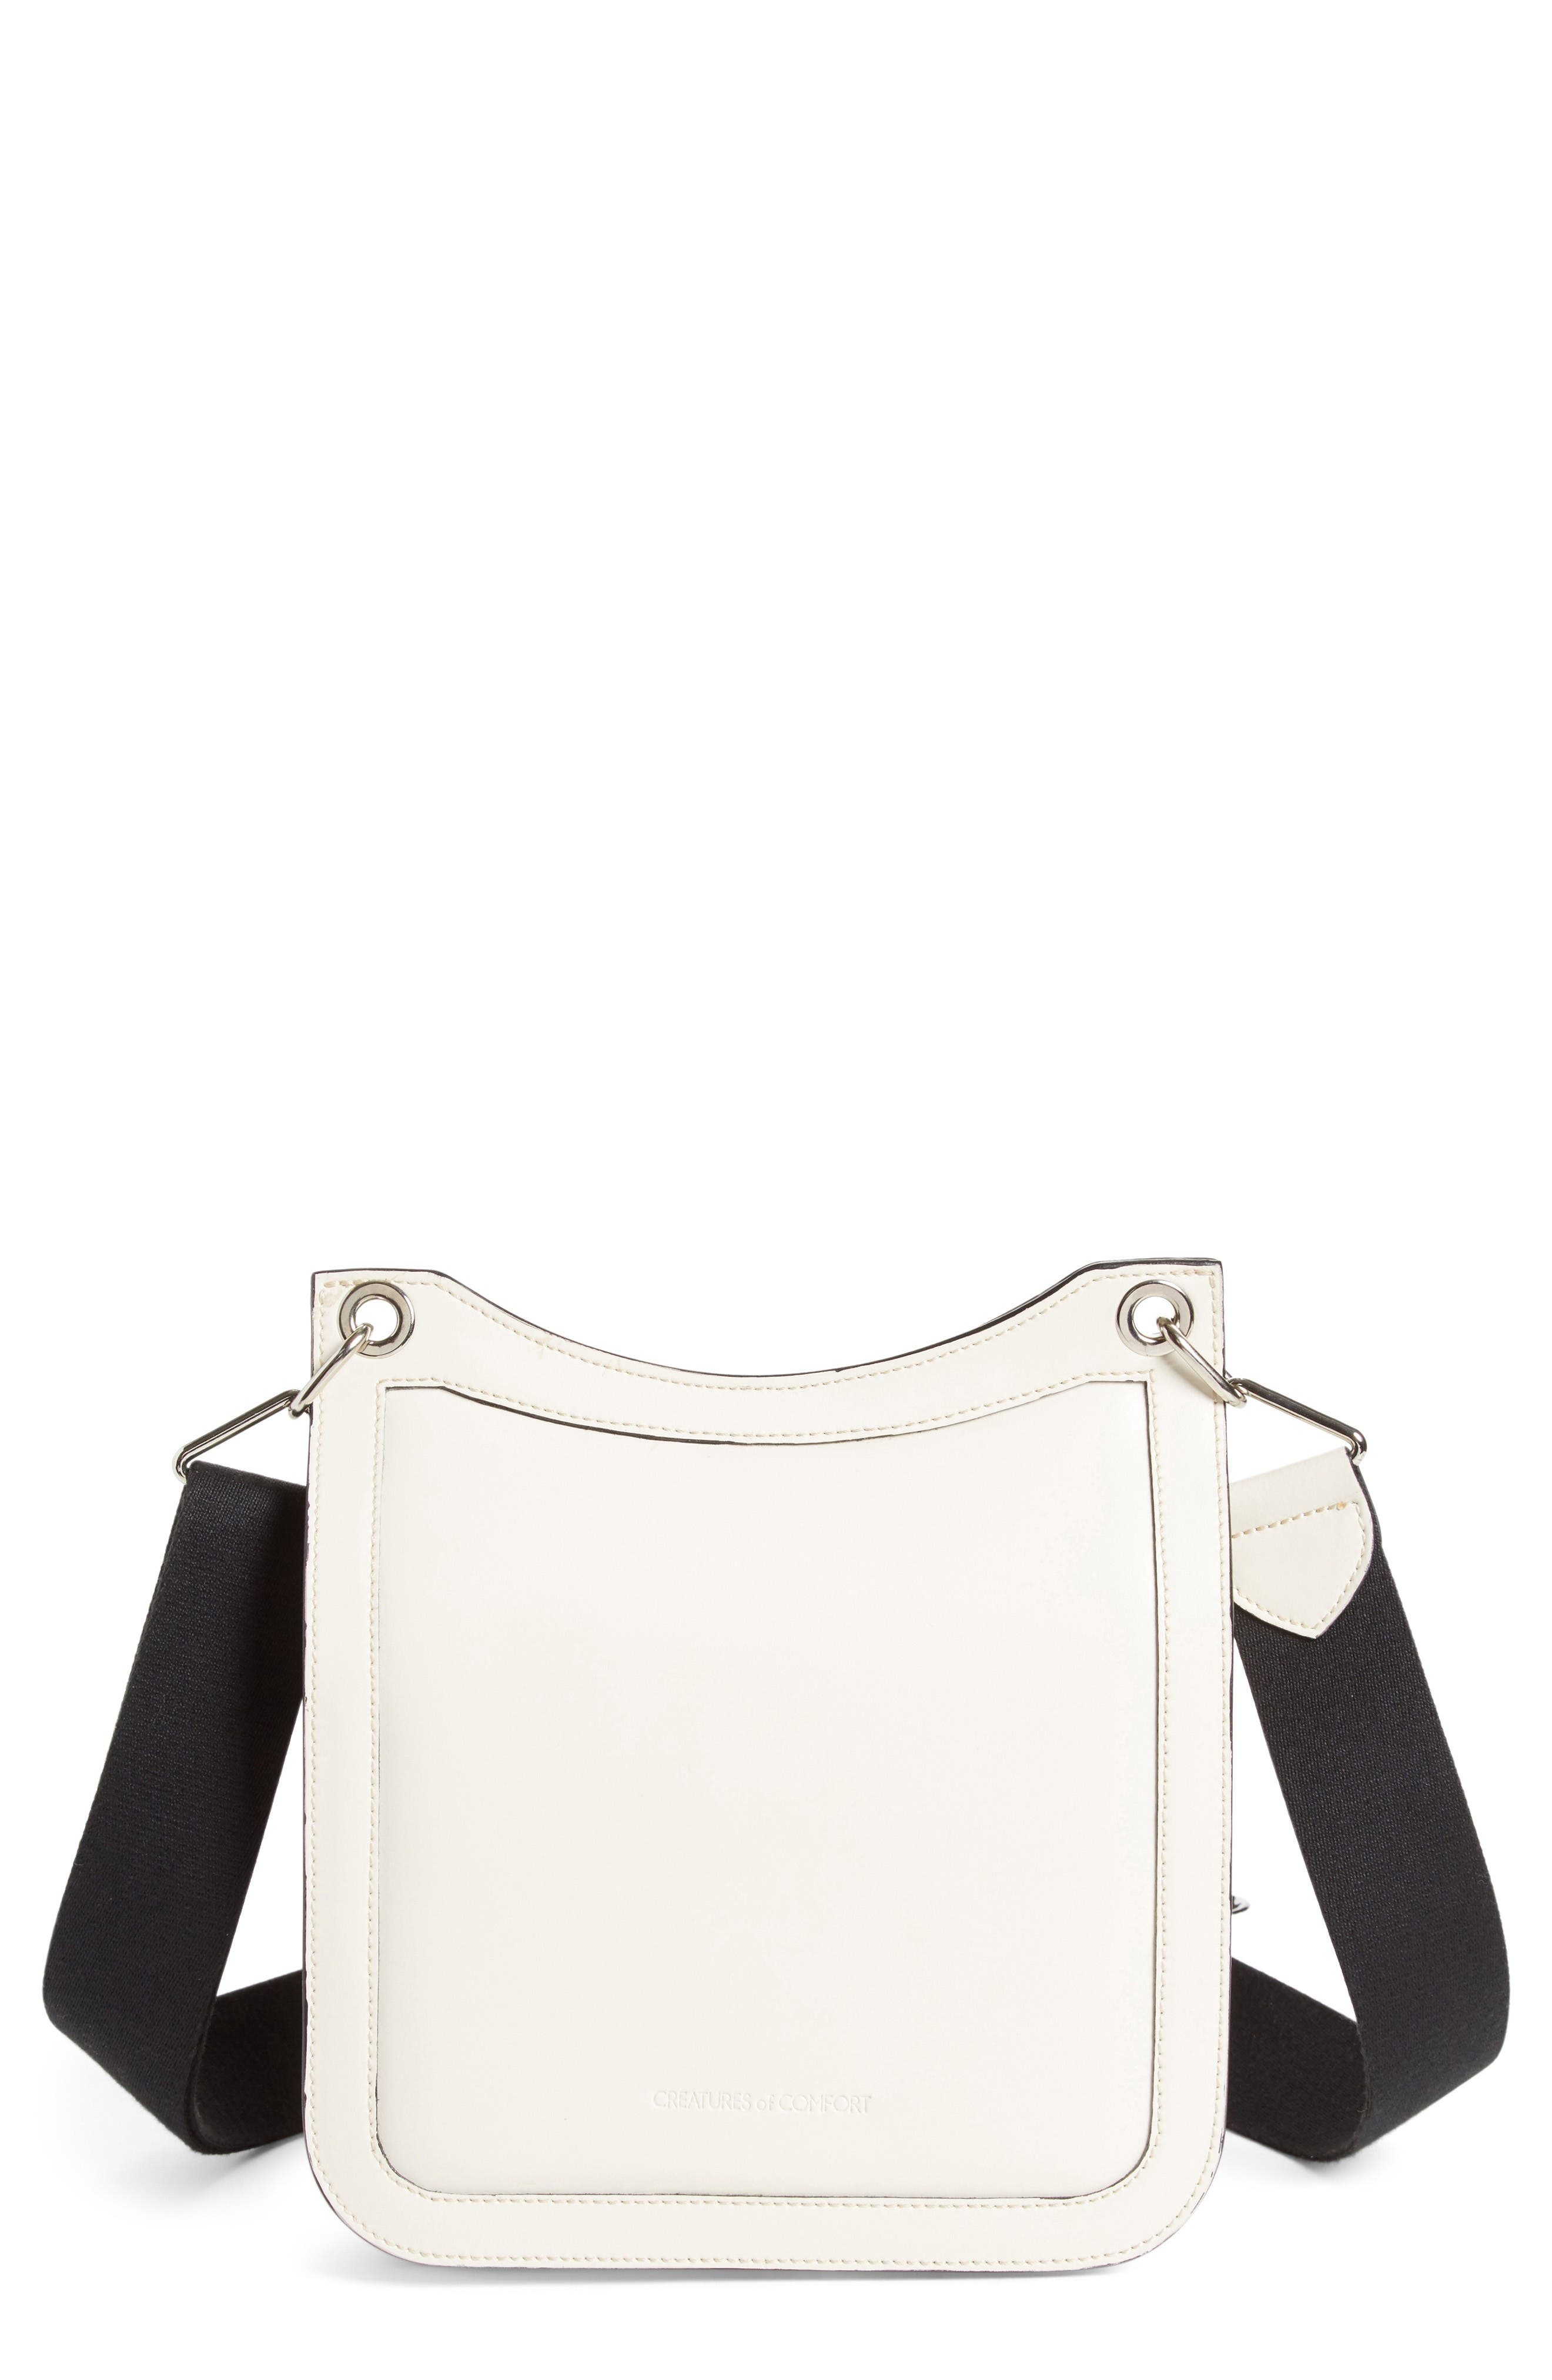 Equestrian Crossbody Bag,                             Main thumbnail 1, color,                             White